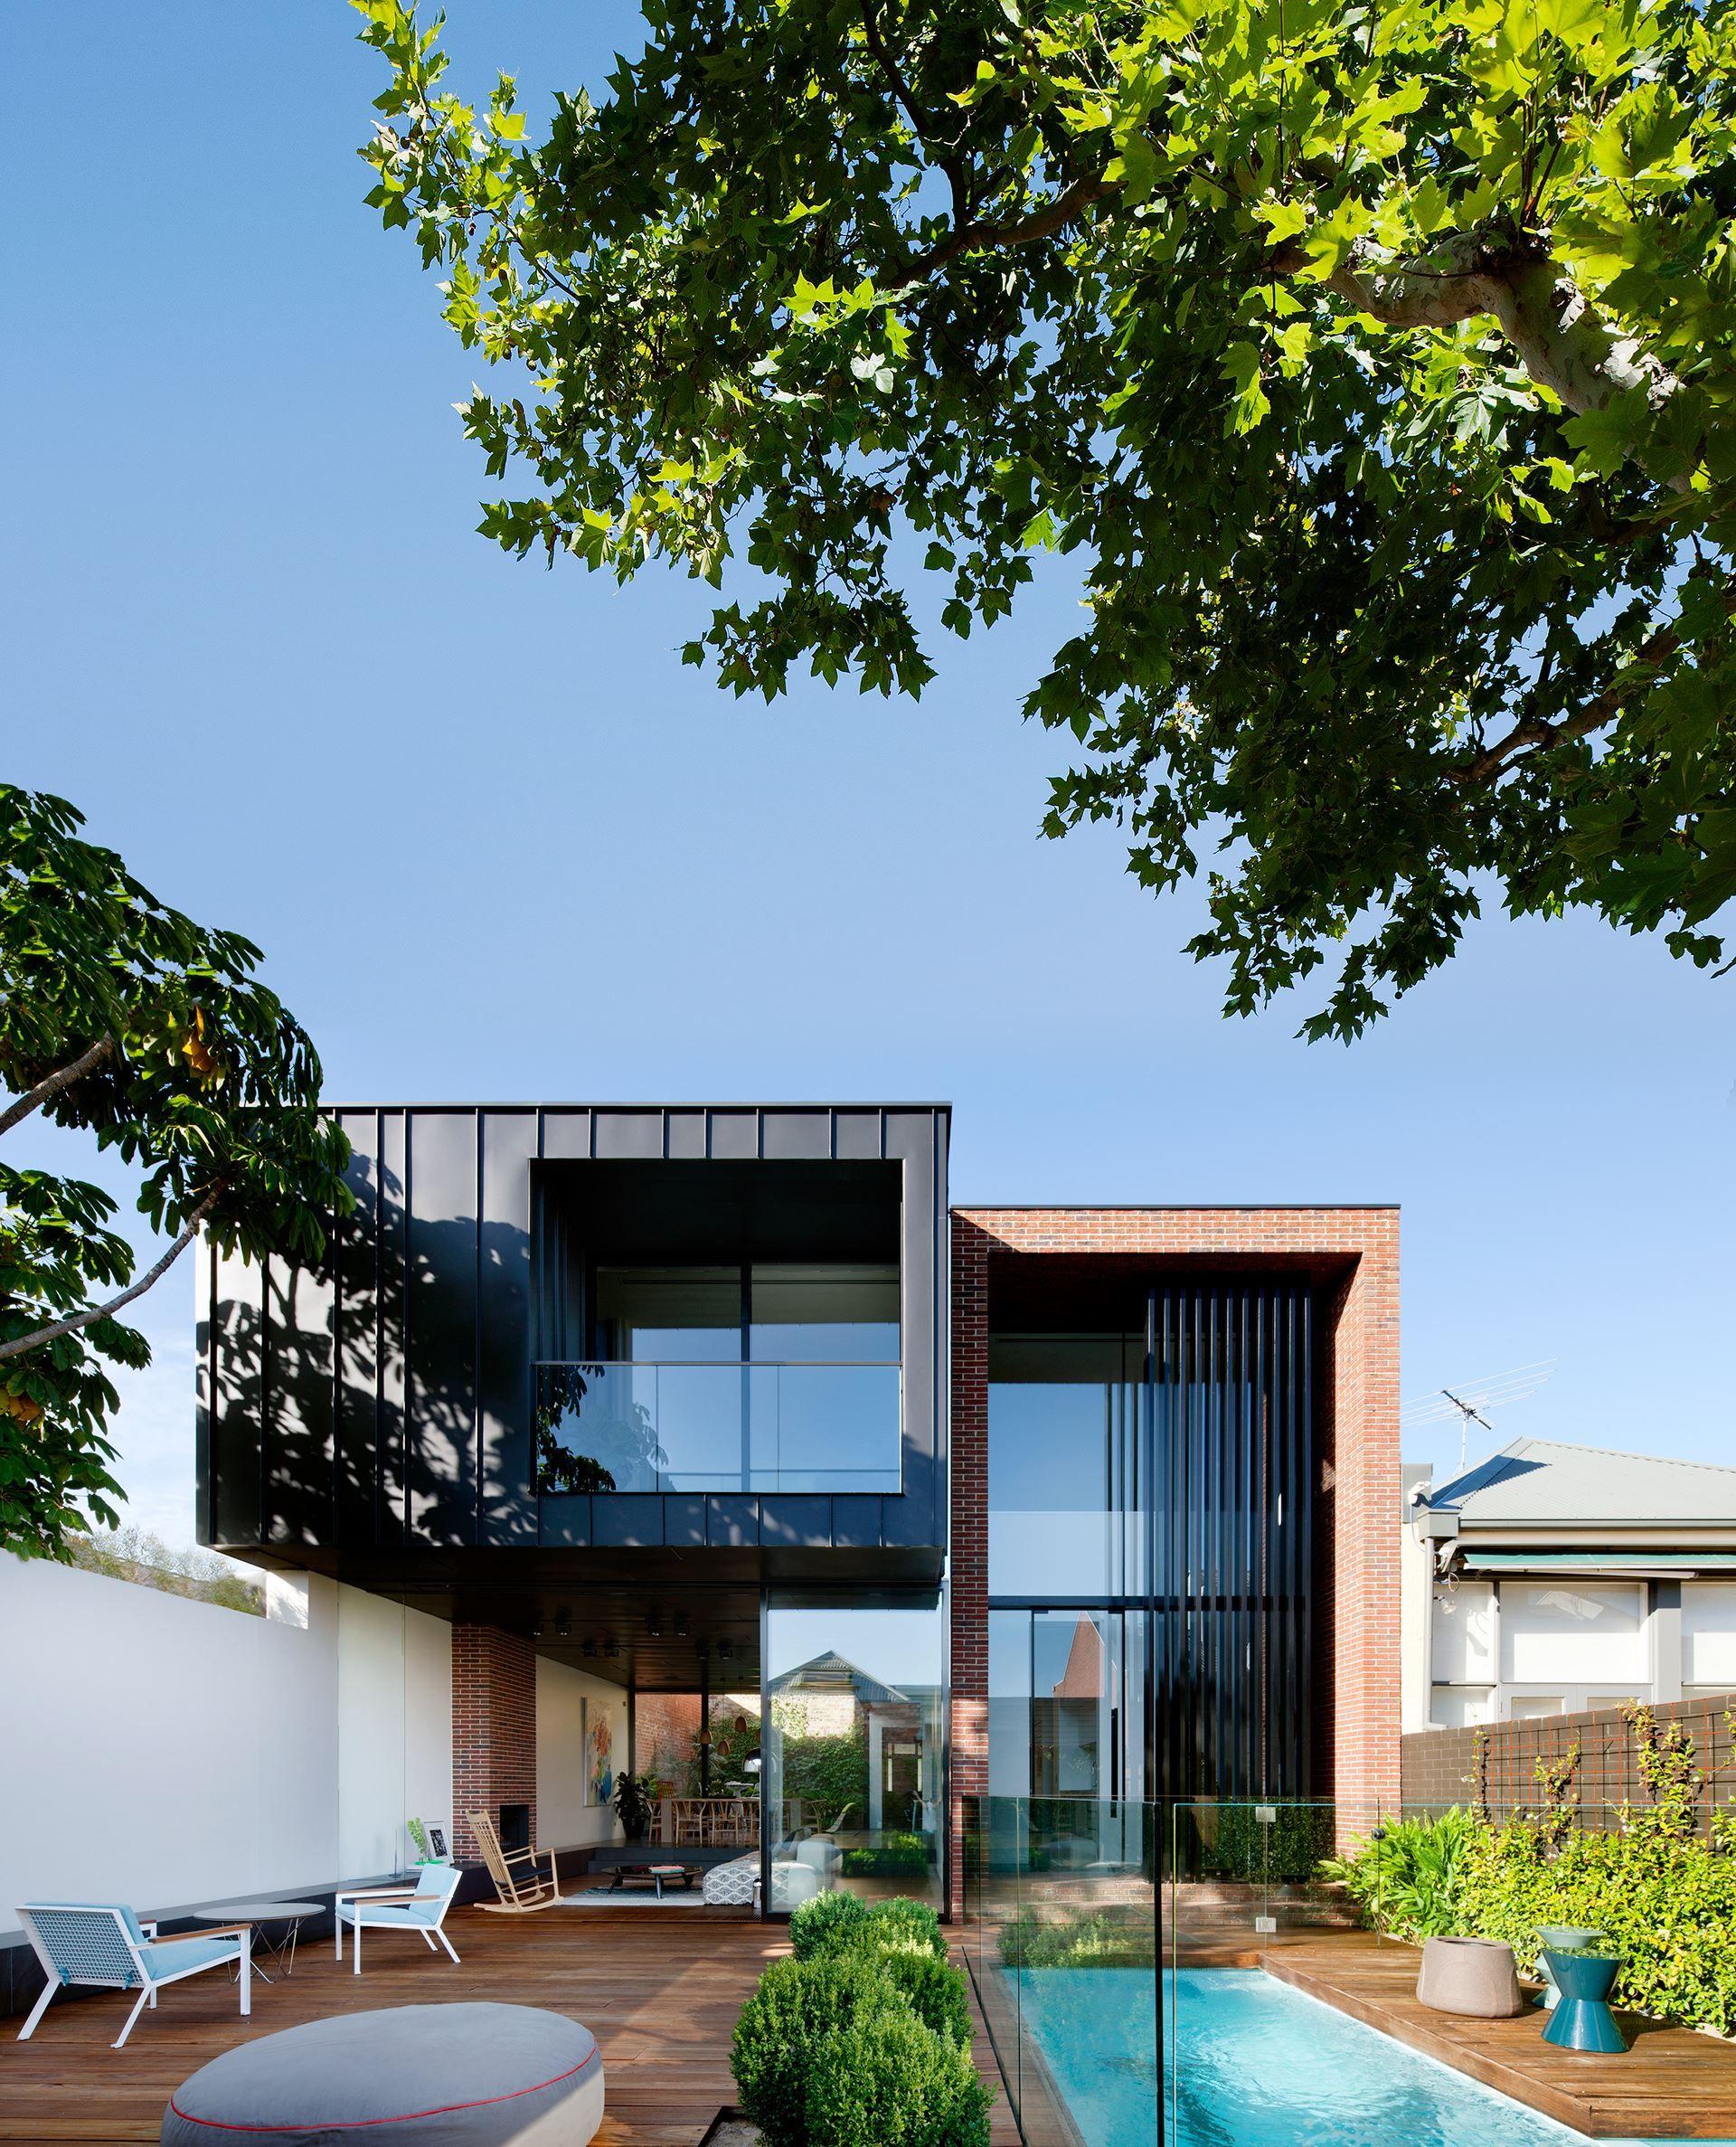 Ultra-modern Addition Rear Of House Belies